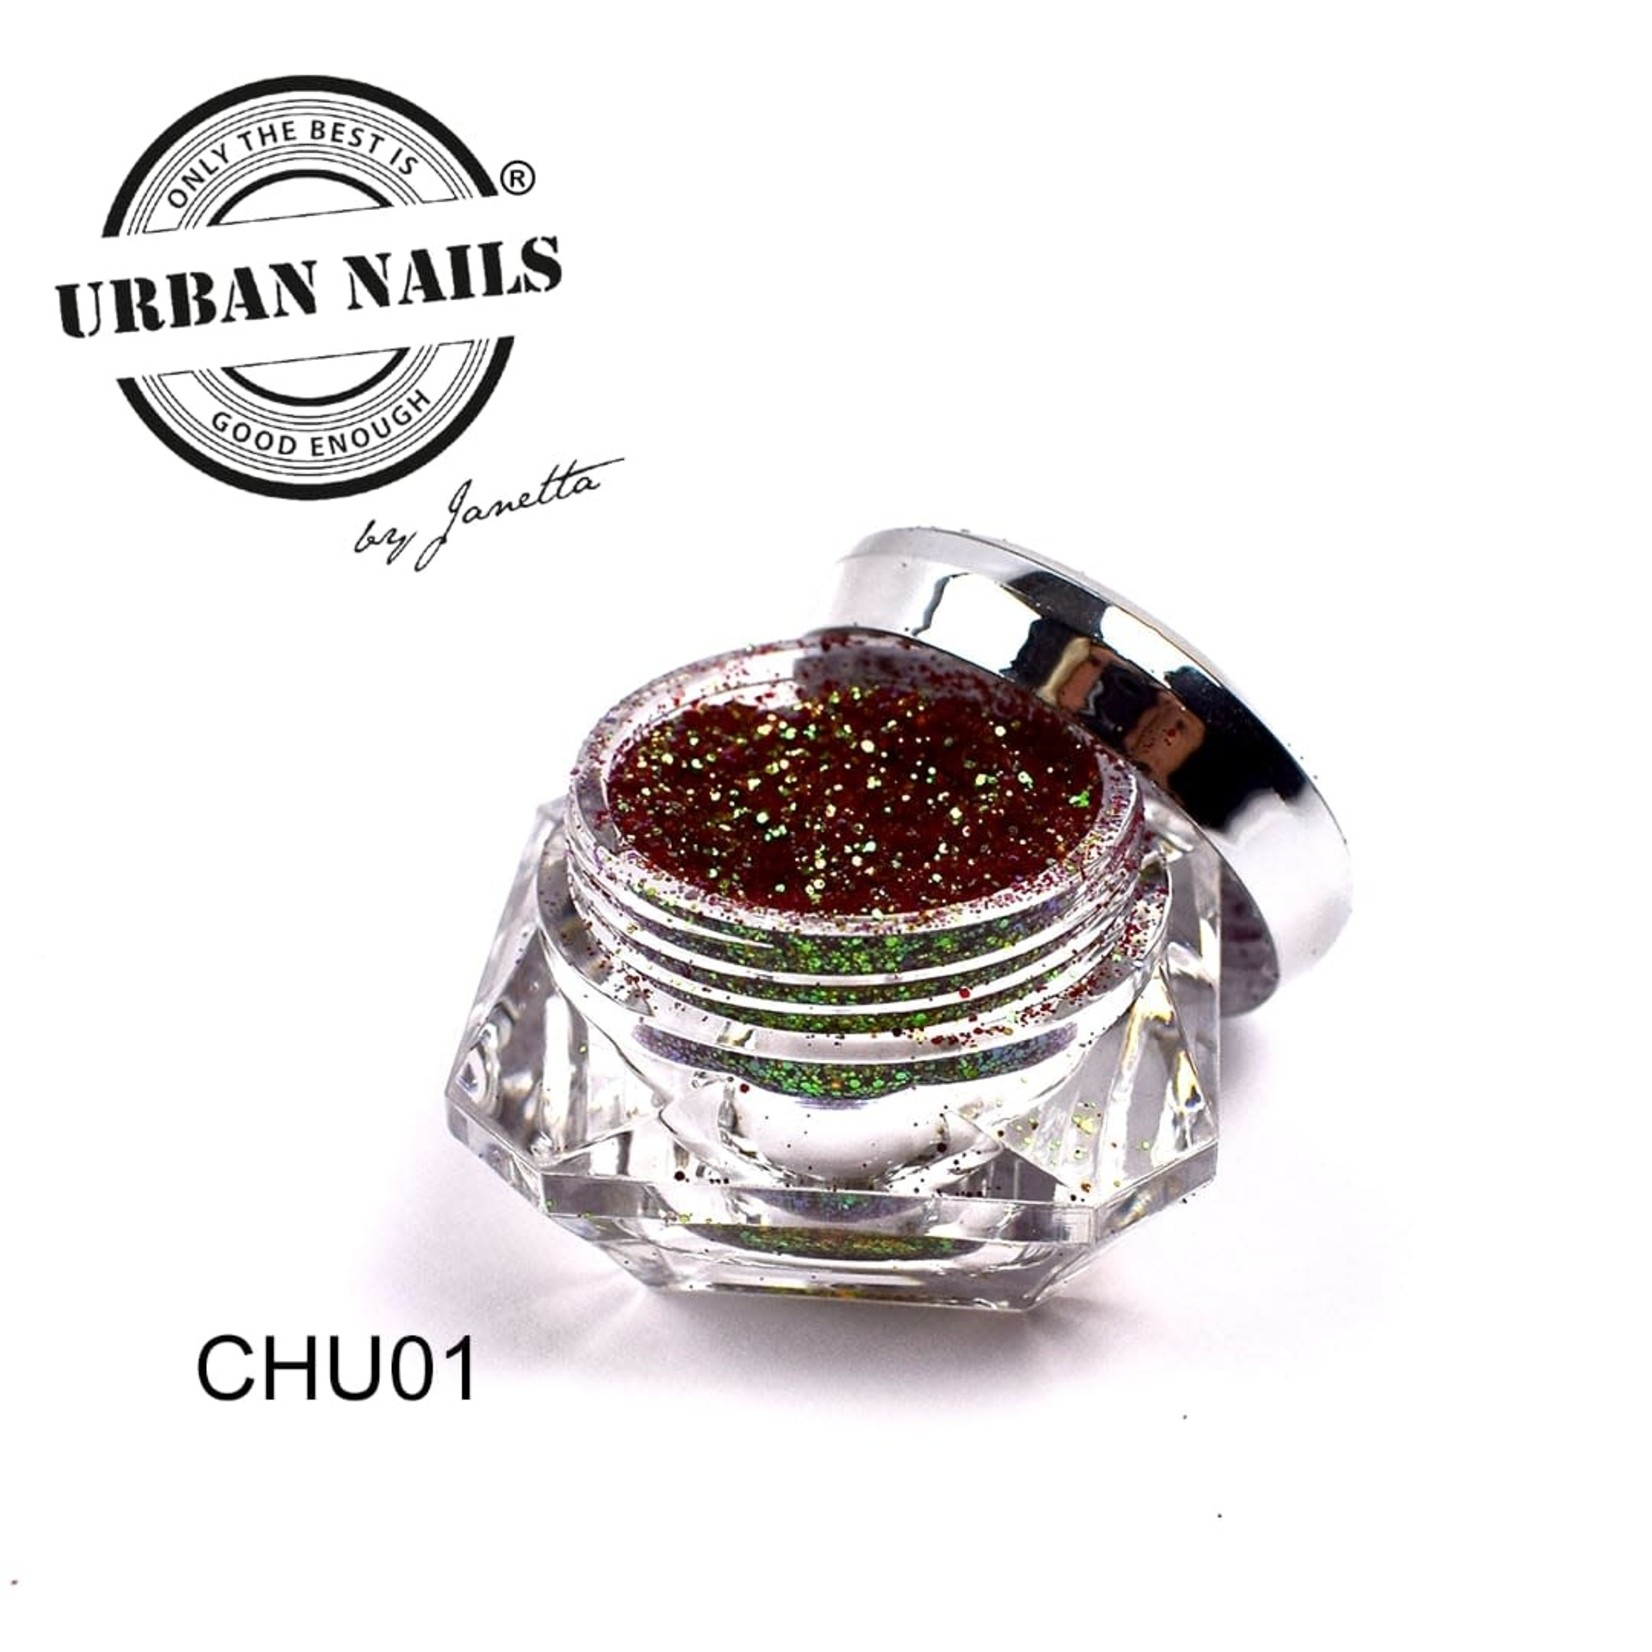 Urban Nails Chunky Chameleon 01 Bruin/Rood